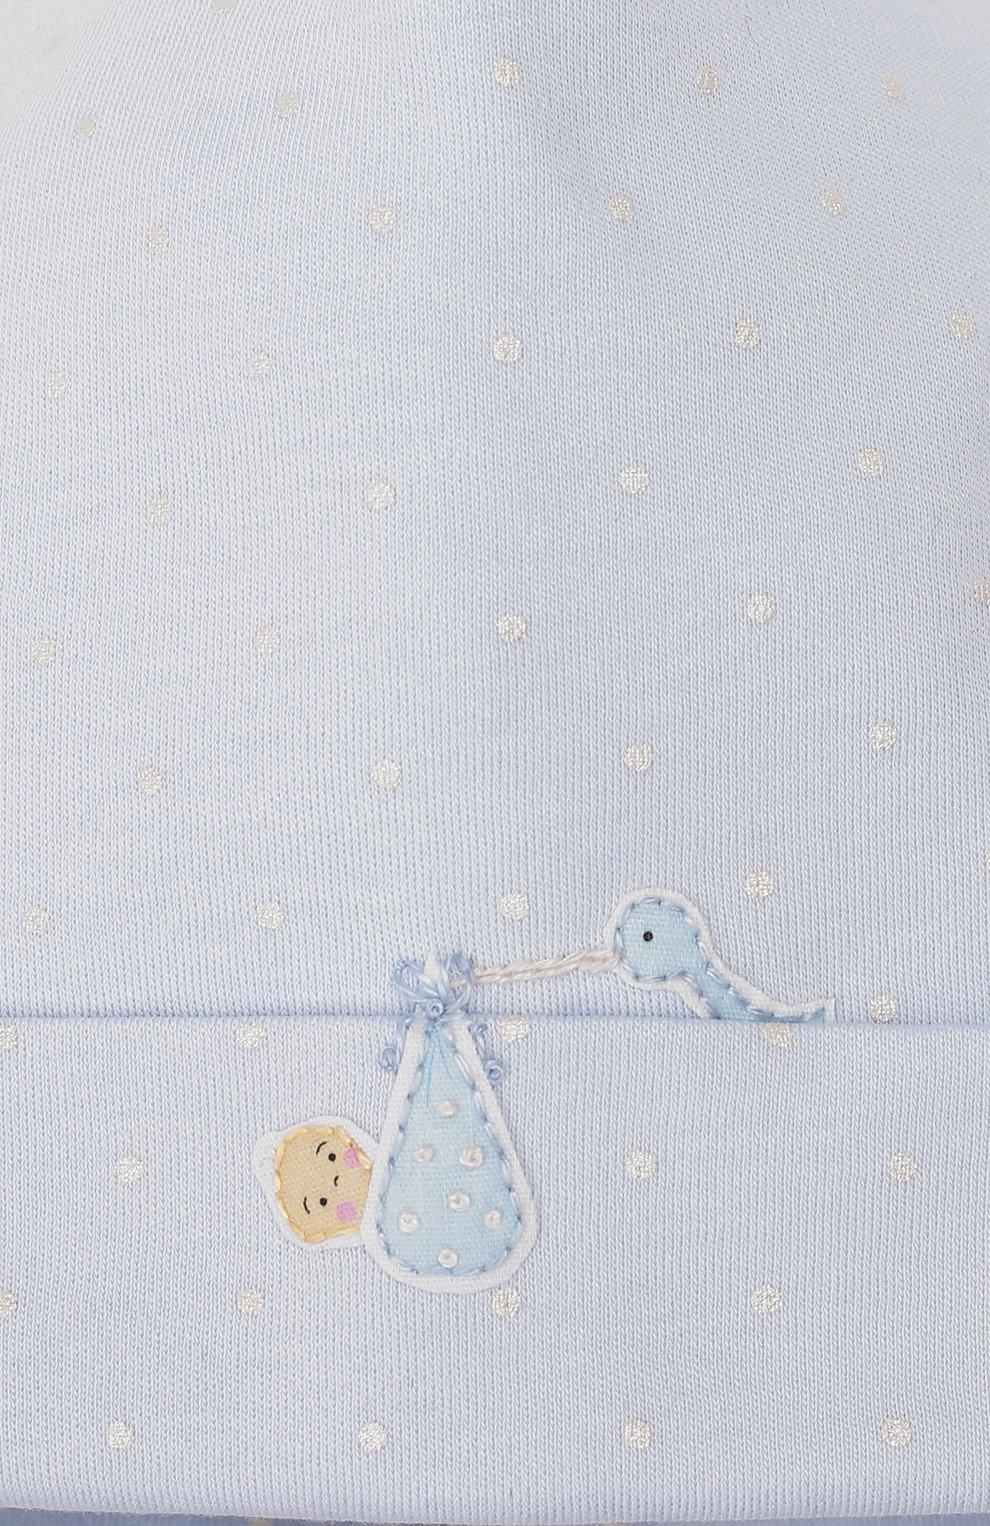 Детского шапка noah's friends MAGNOLIA BABY синего цвета, арт. E109-50P-LB | Фото 3 (Материал: Текстиль, Хлопок; Кросс-КТ НВ: Шапочки-аксессуары)